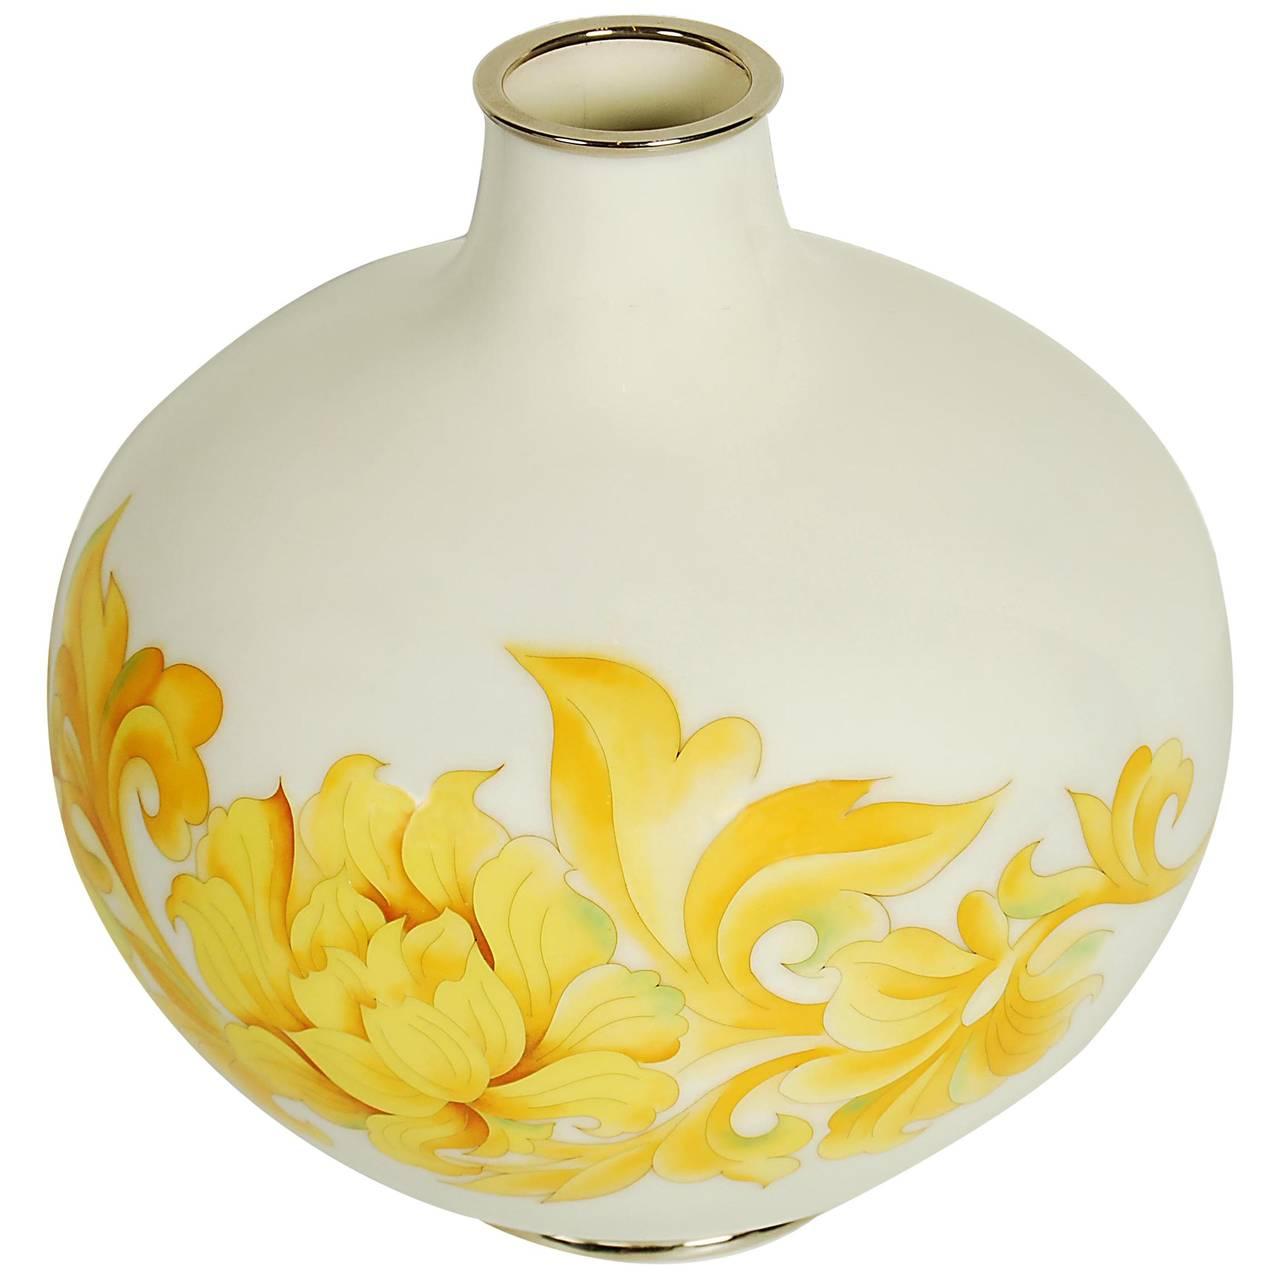 Vintage japanese ando cloisonne vase 20th century for sale at 1stdibs vintage japanese ando cloisonne vase 20th century for sale reviewsmspy